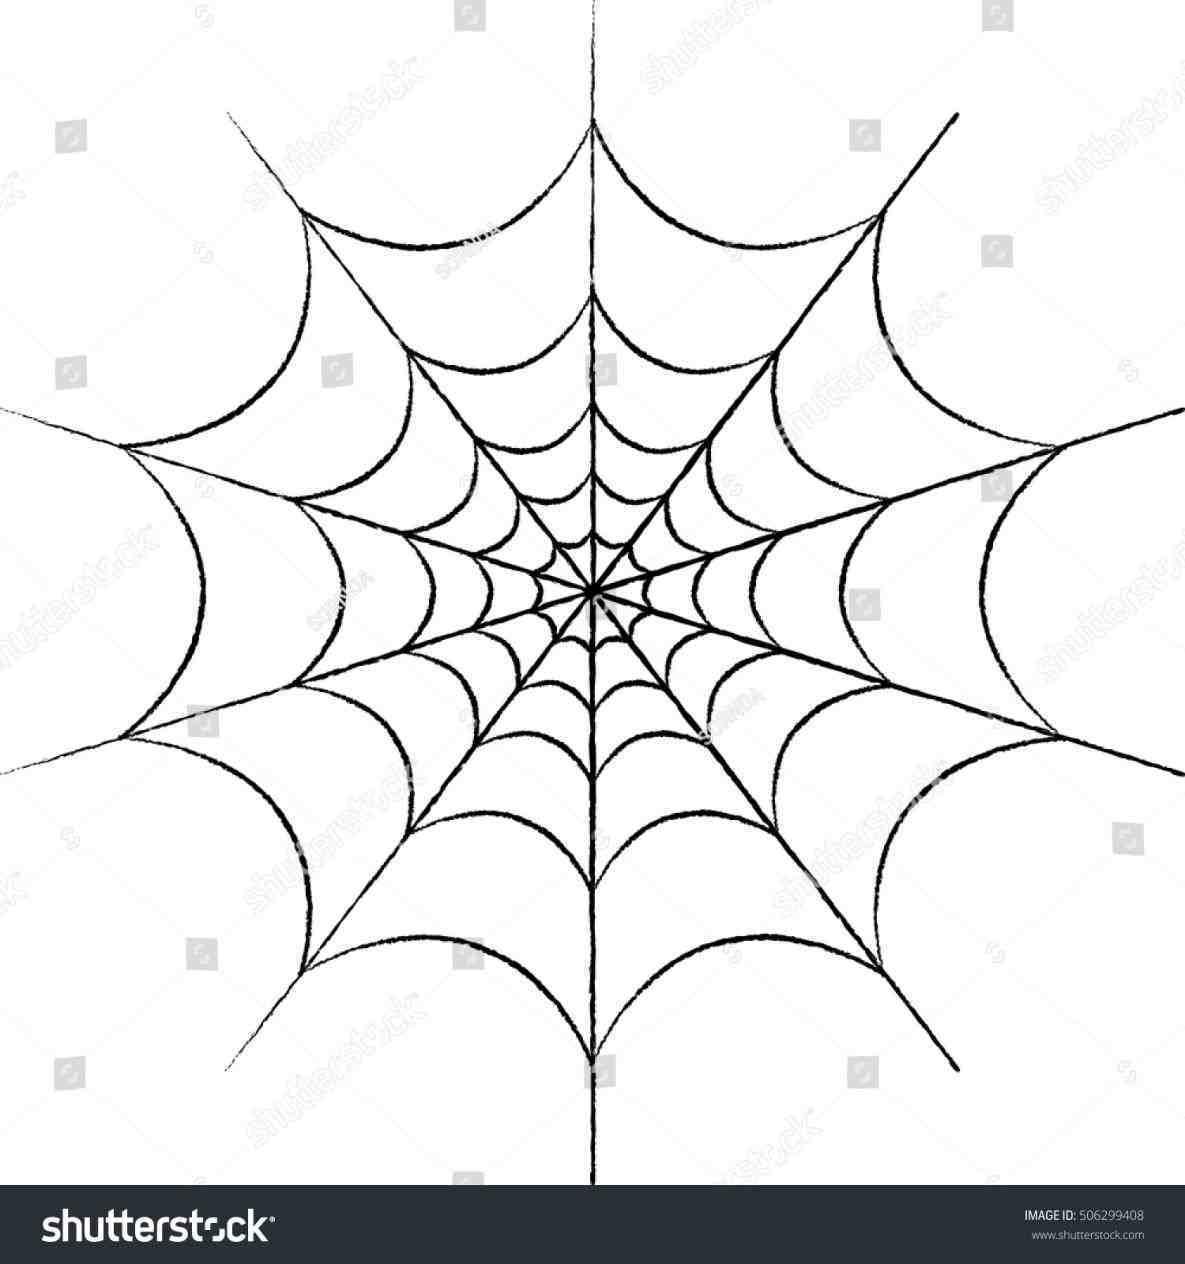 1185x1264 Shutterstock Vector Corner Spider Web Template Spider Web Stock